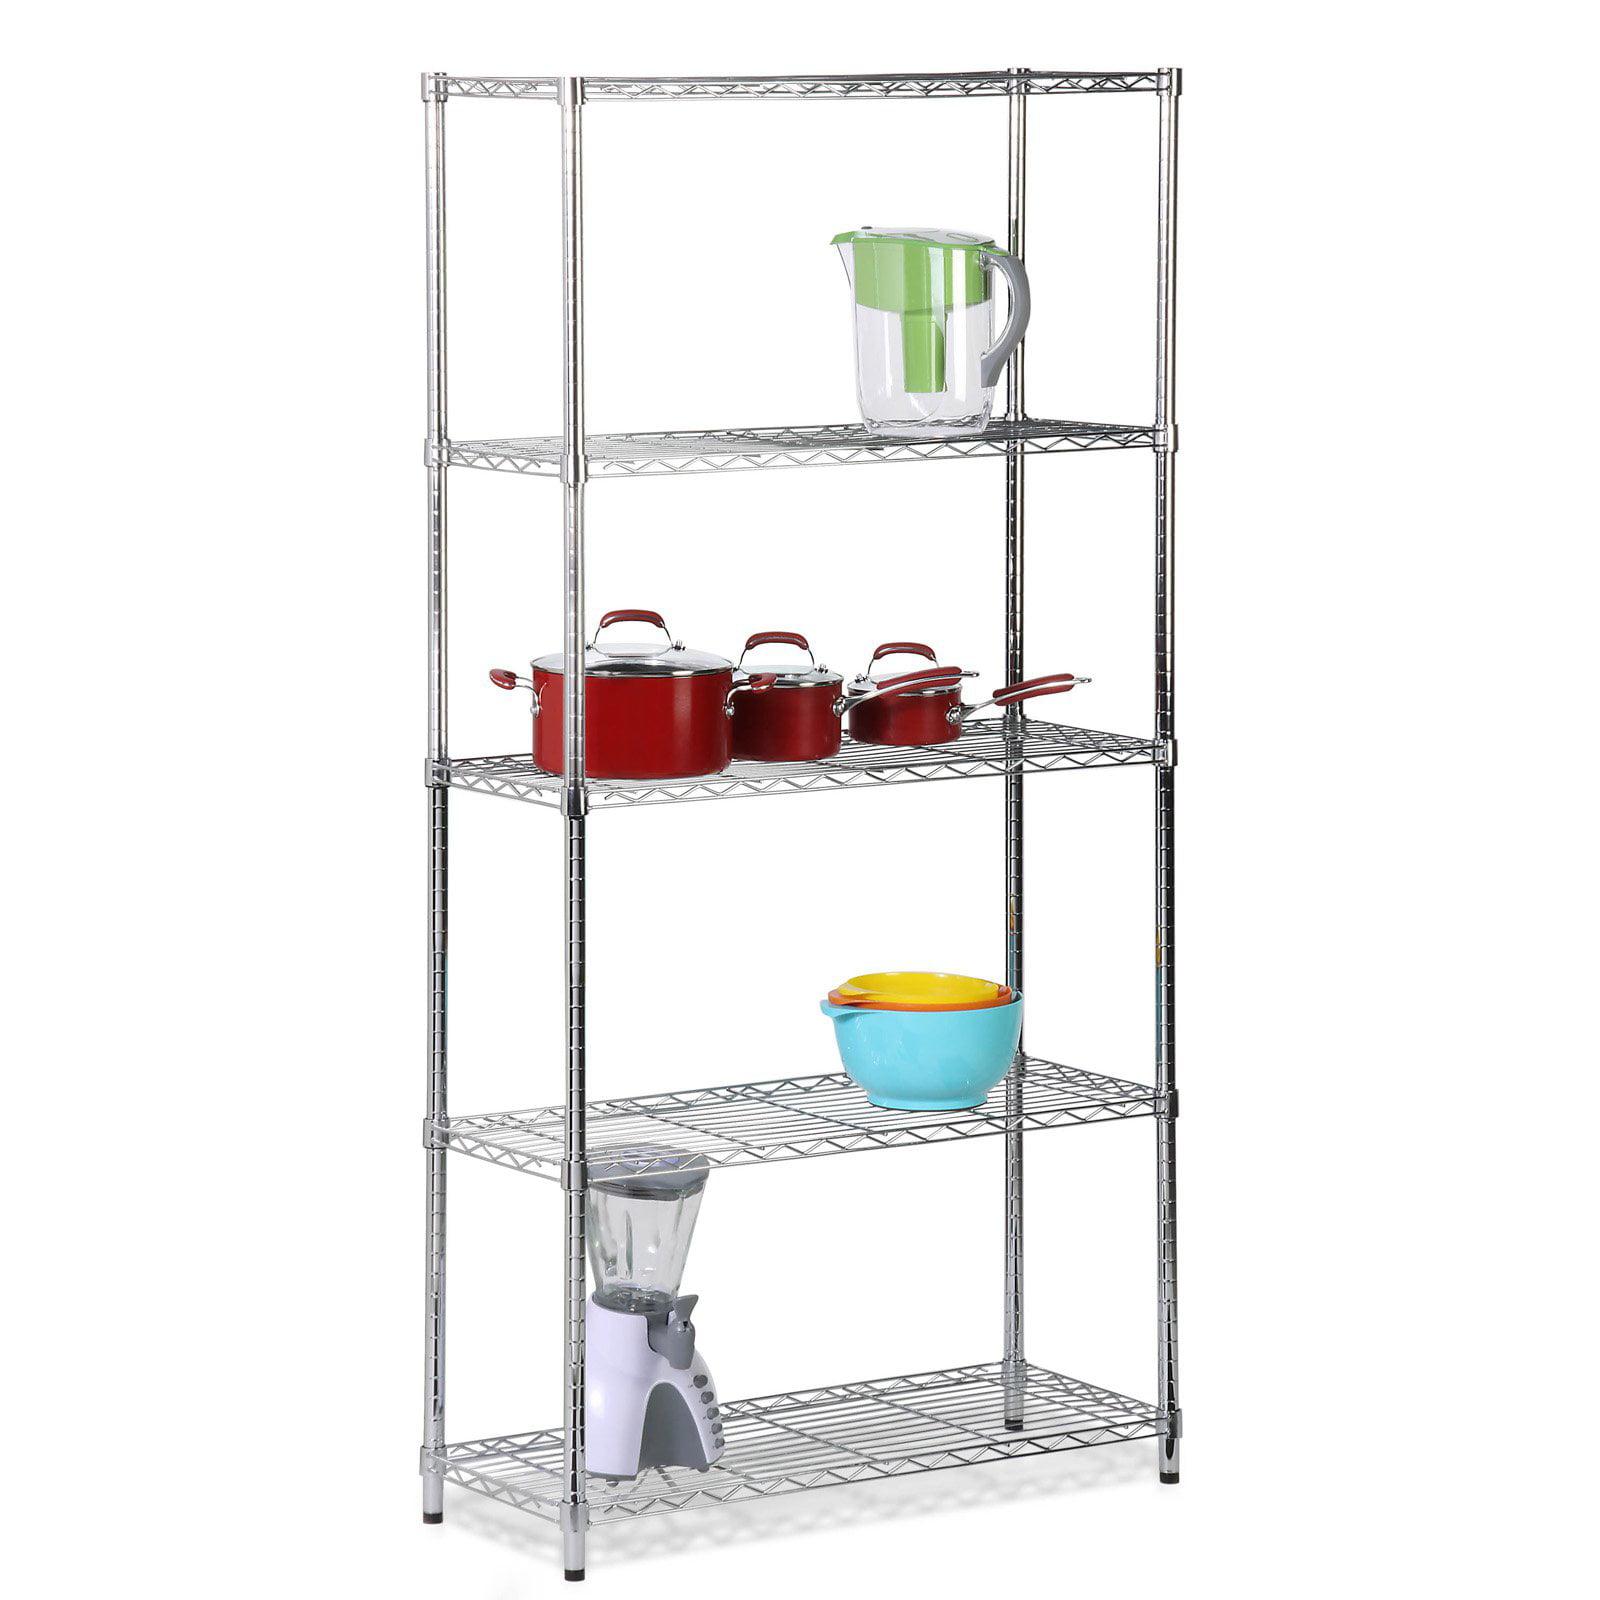 Honey Can Do Urban 5-Shelf Adjustable Steel Storage Shelving Unit, Chrome by Honey Can Do